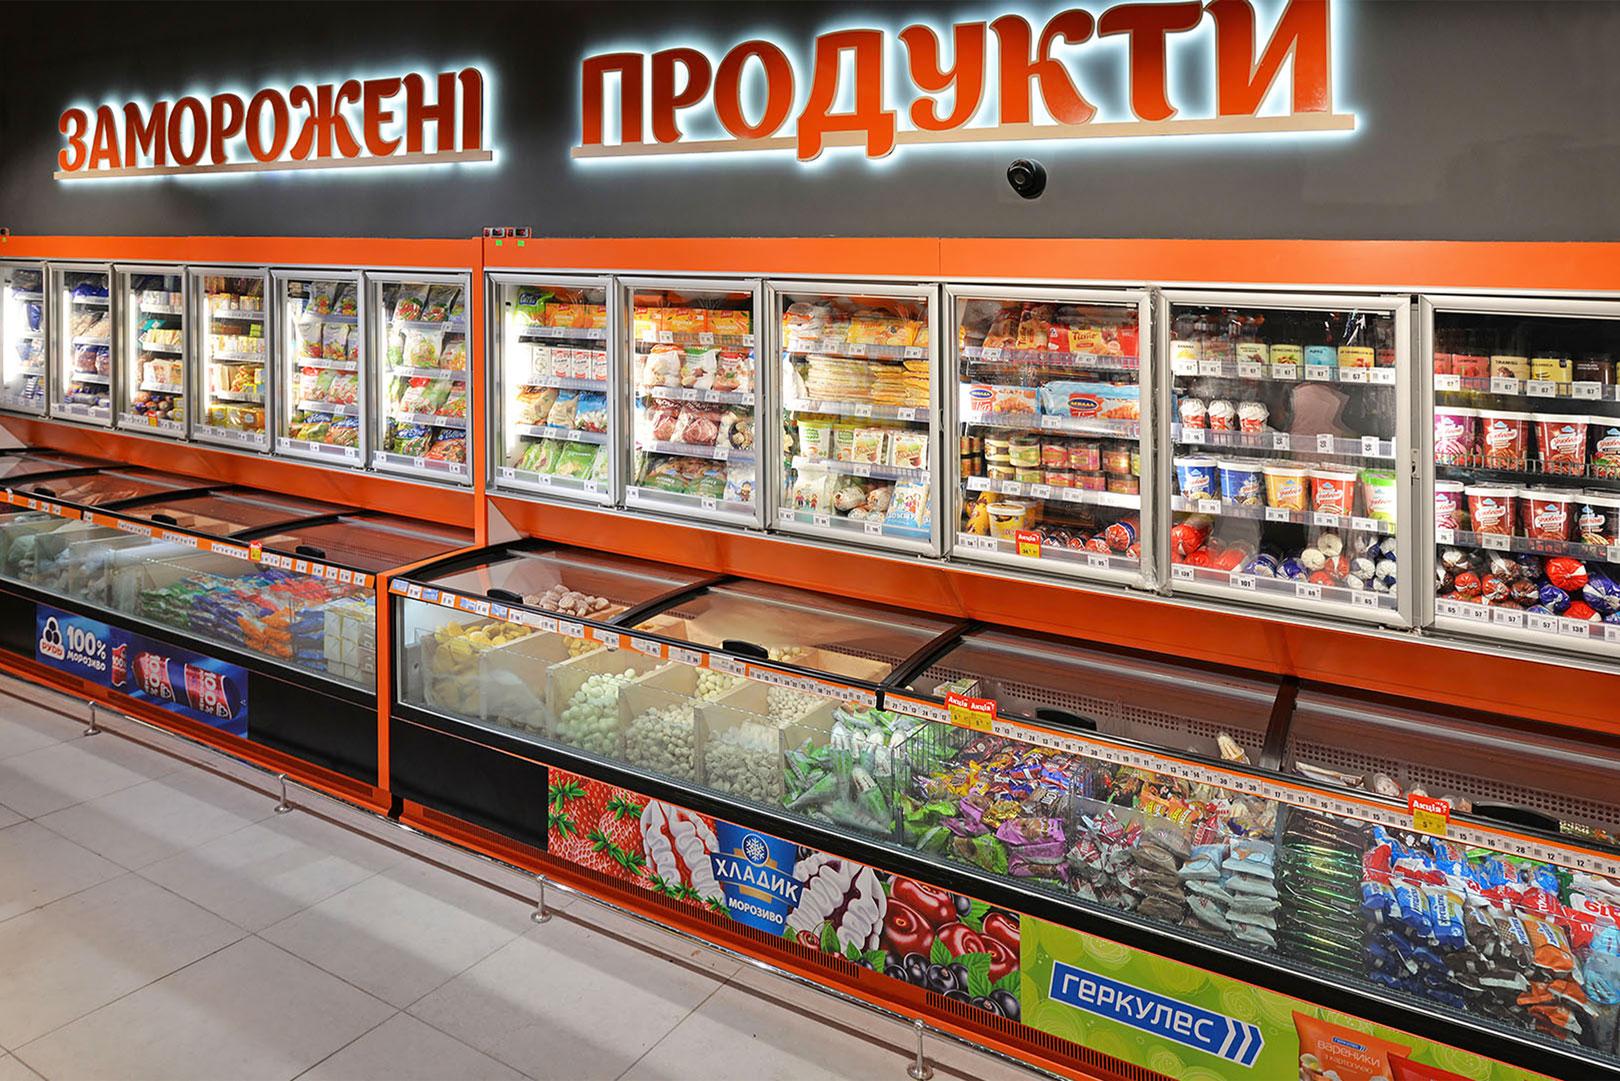 Frozen foods units Alaska combi 2 SD MHV 110 LT D/C 220-DLM